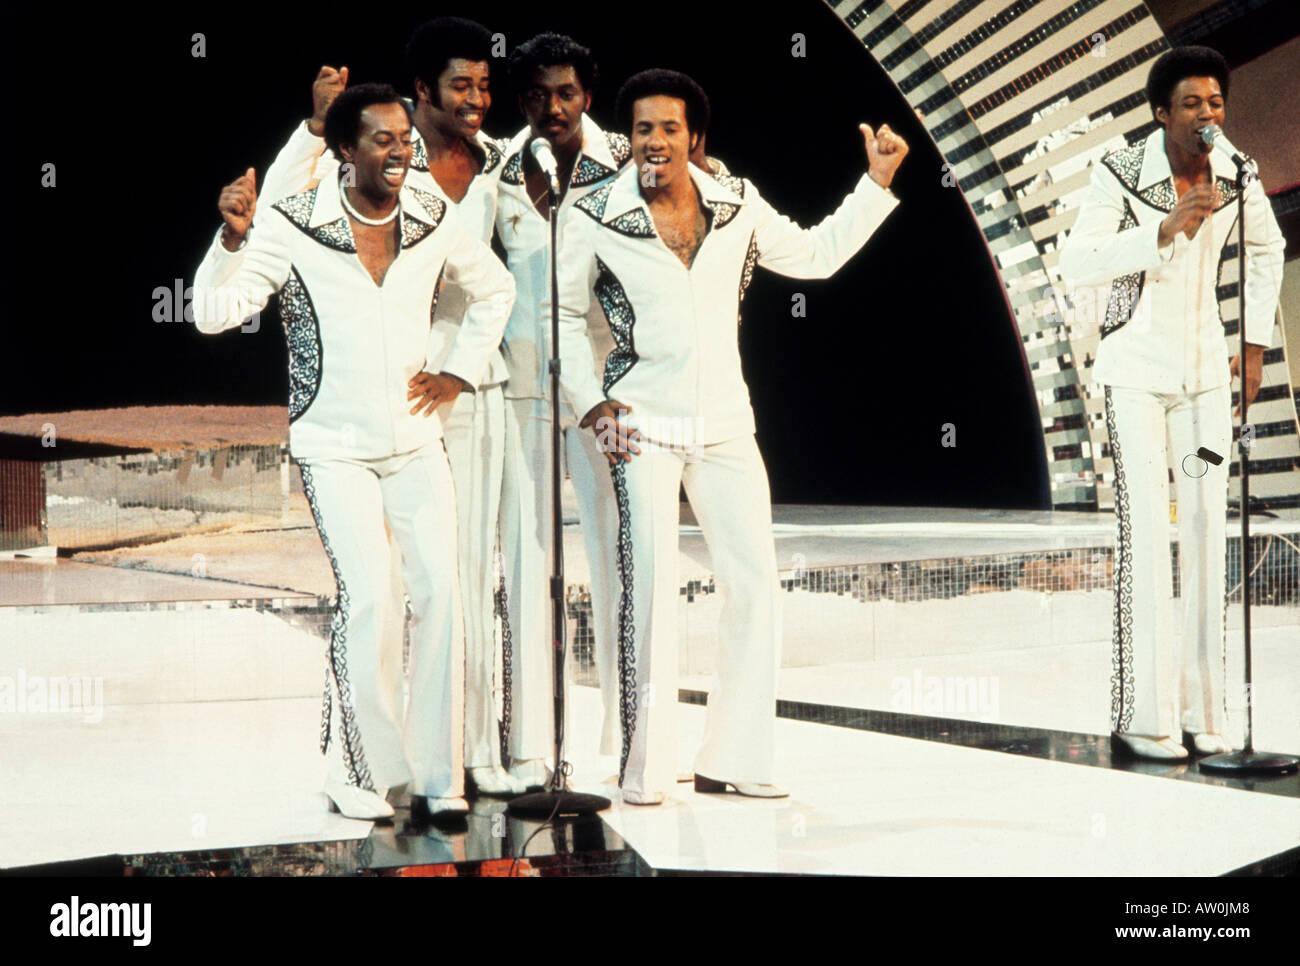 Versuchungen uns Gruppe Ende 80er Jahre Stockbild